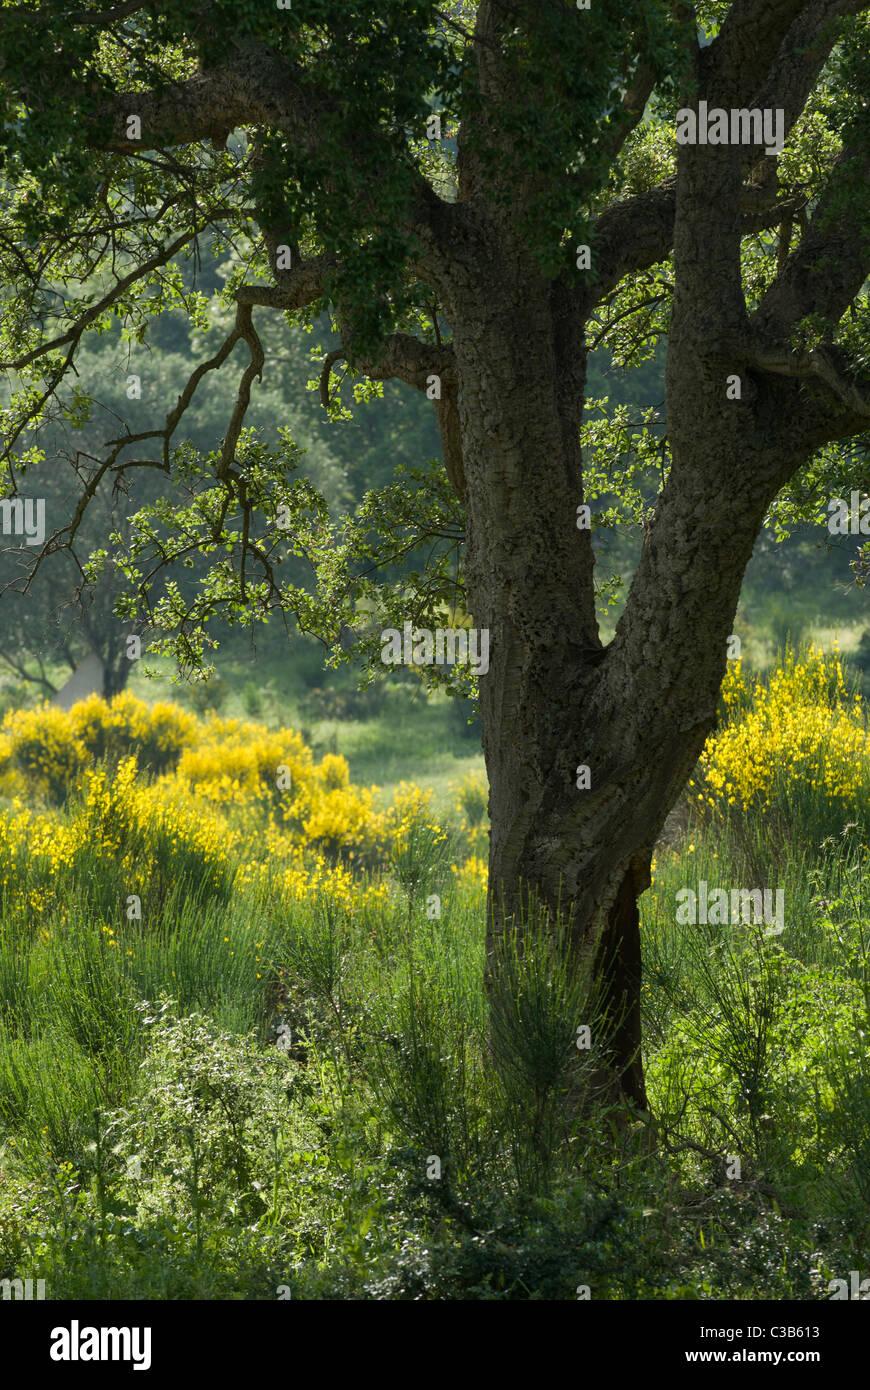 Cork Oak (Quercus suber) in maquis vegetation, Corsica, France - Stock Image